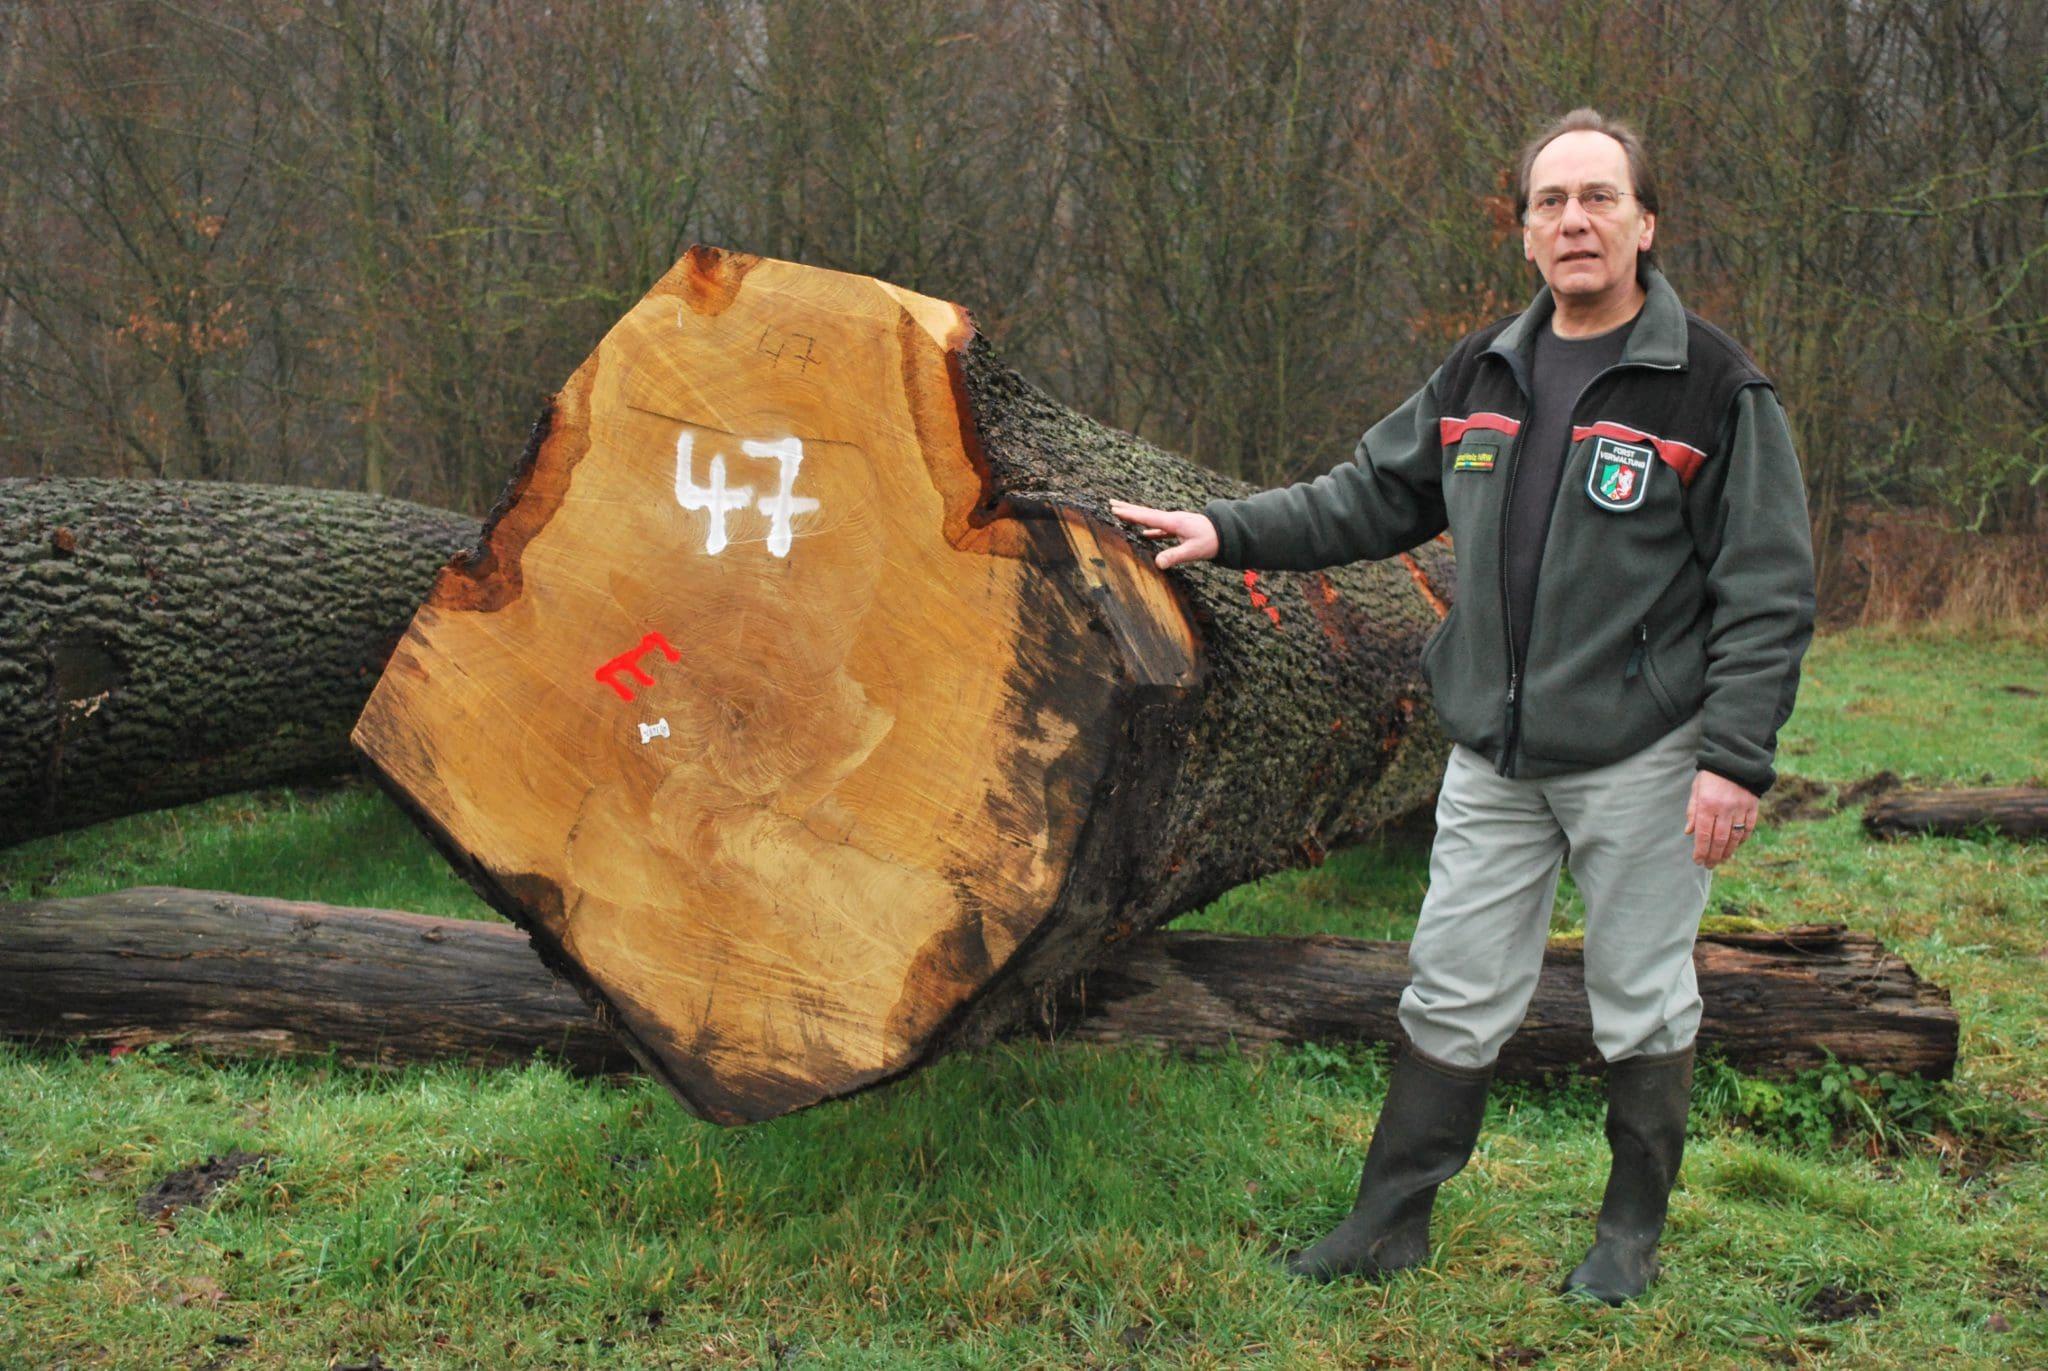 Holz unterm